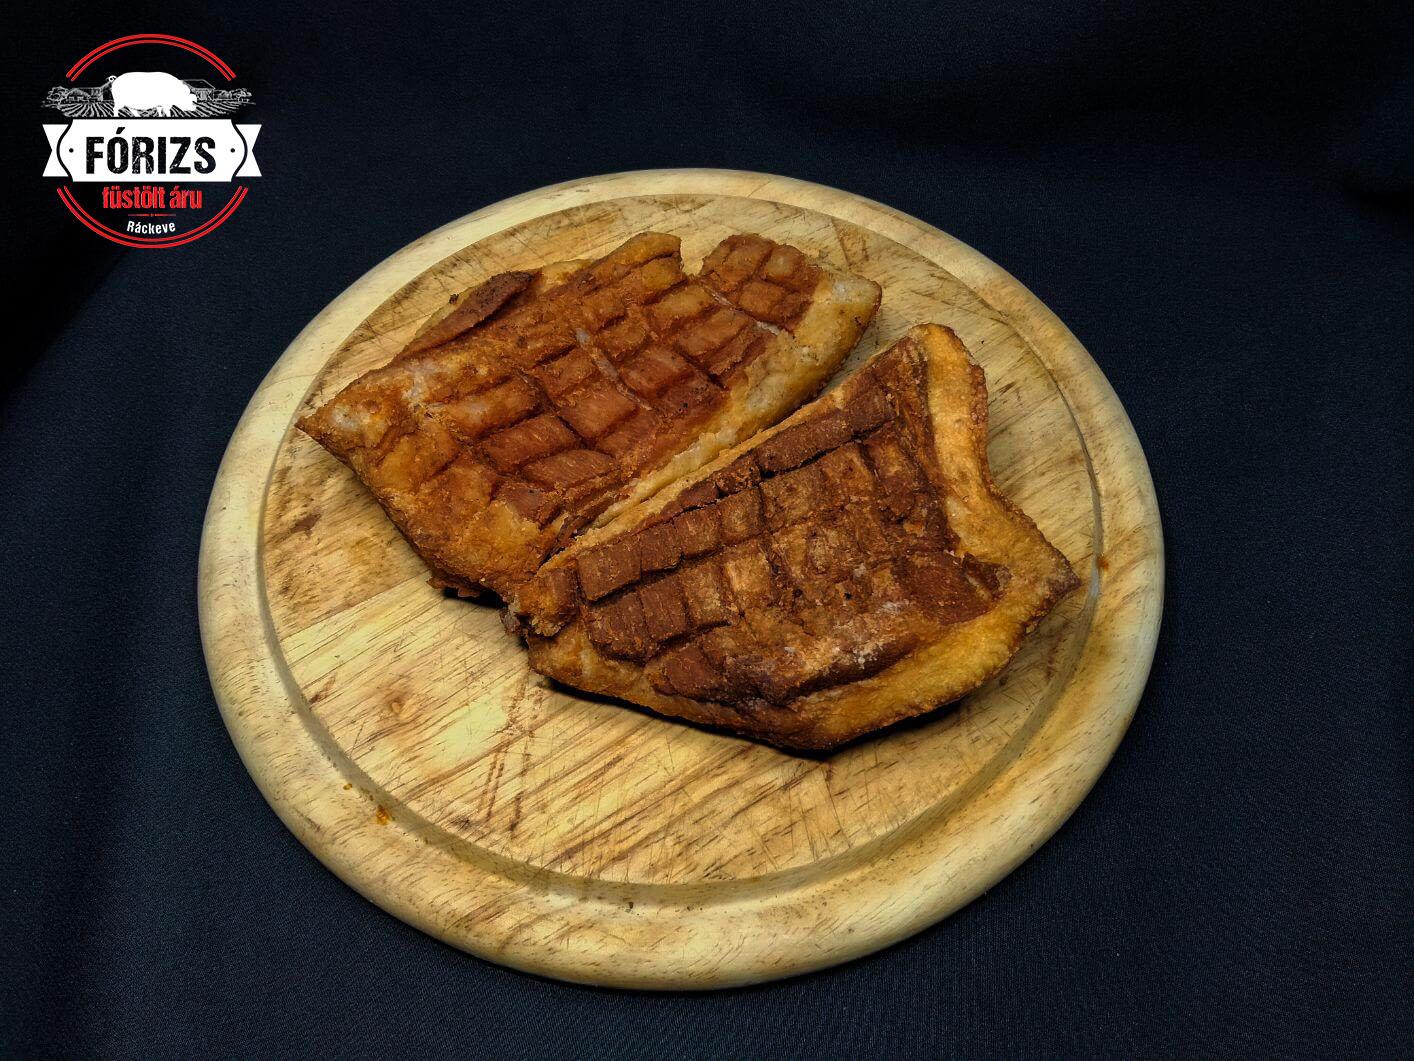 sult-porc-forizs-fustoltaru-hus-rackeve